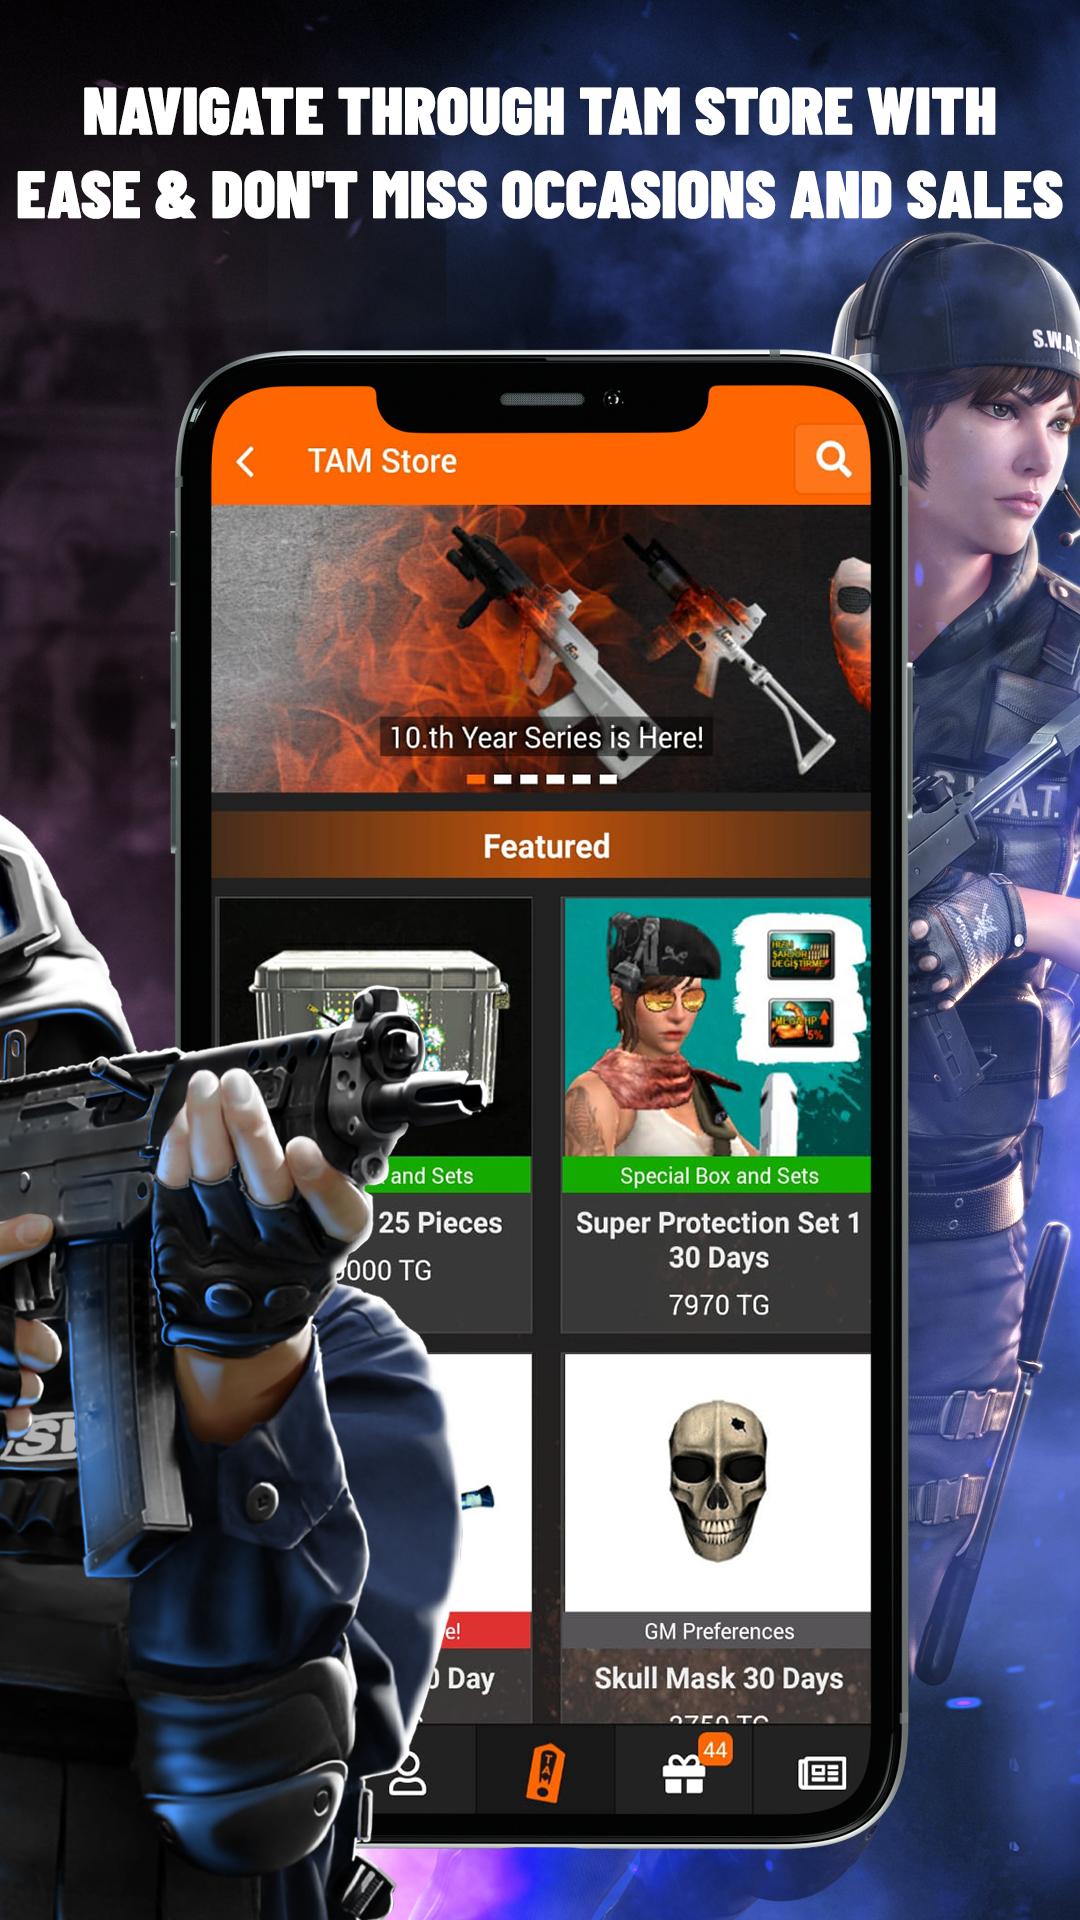 Tam Game Apk 3 1 0 Download For Android Download Tam Game Apk Latest Version Apkfab Com